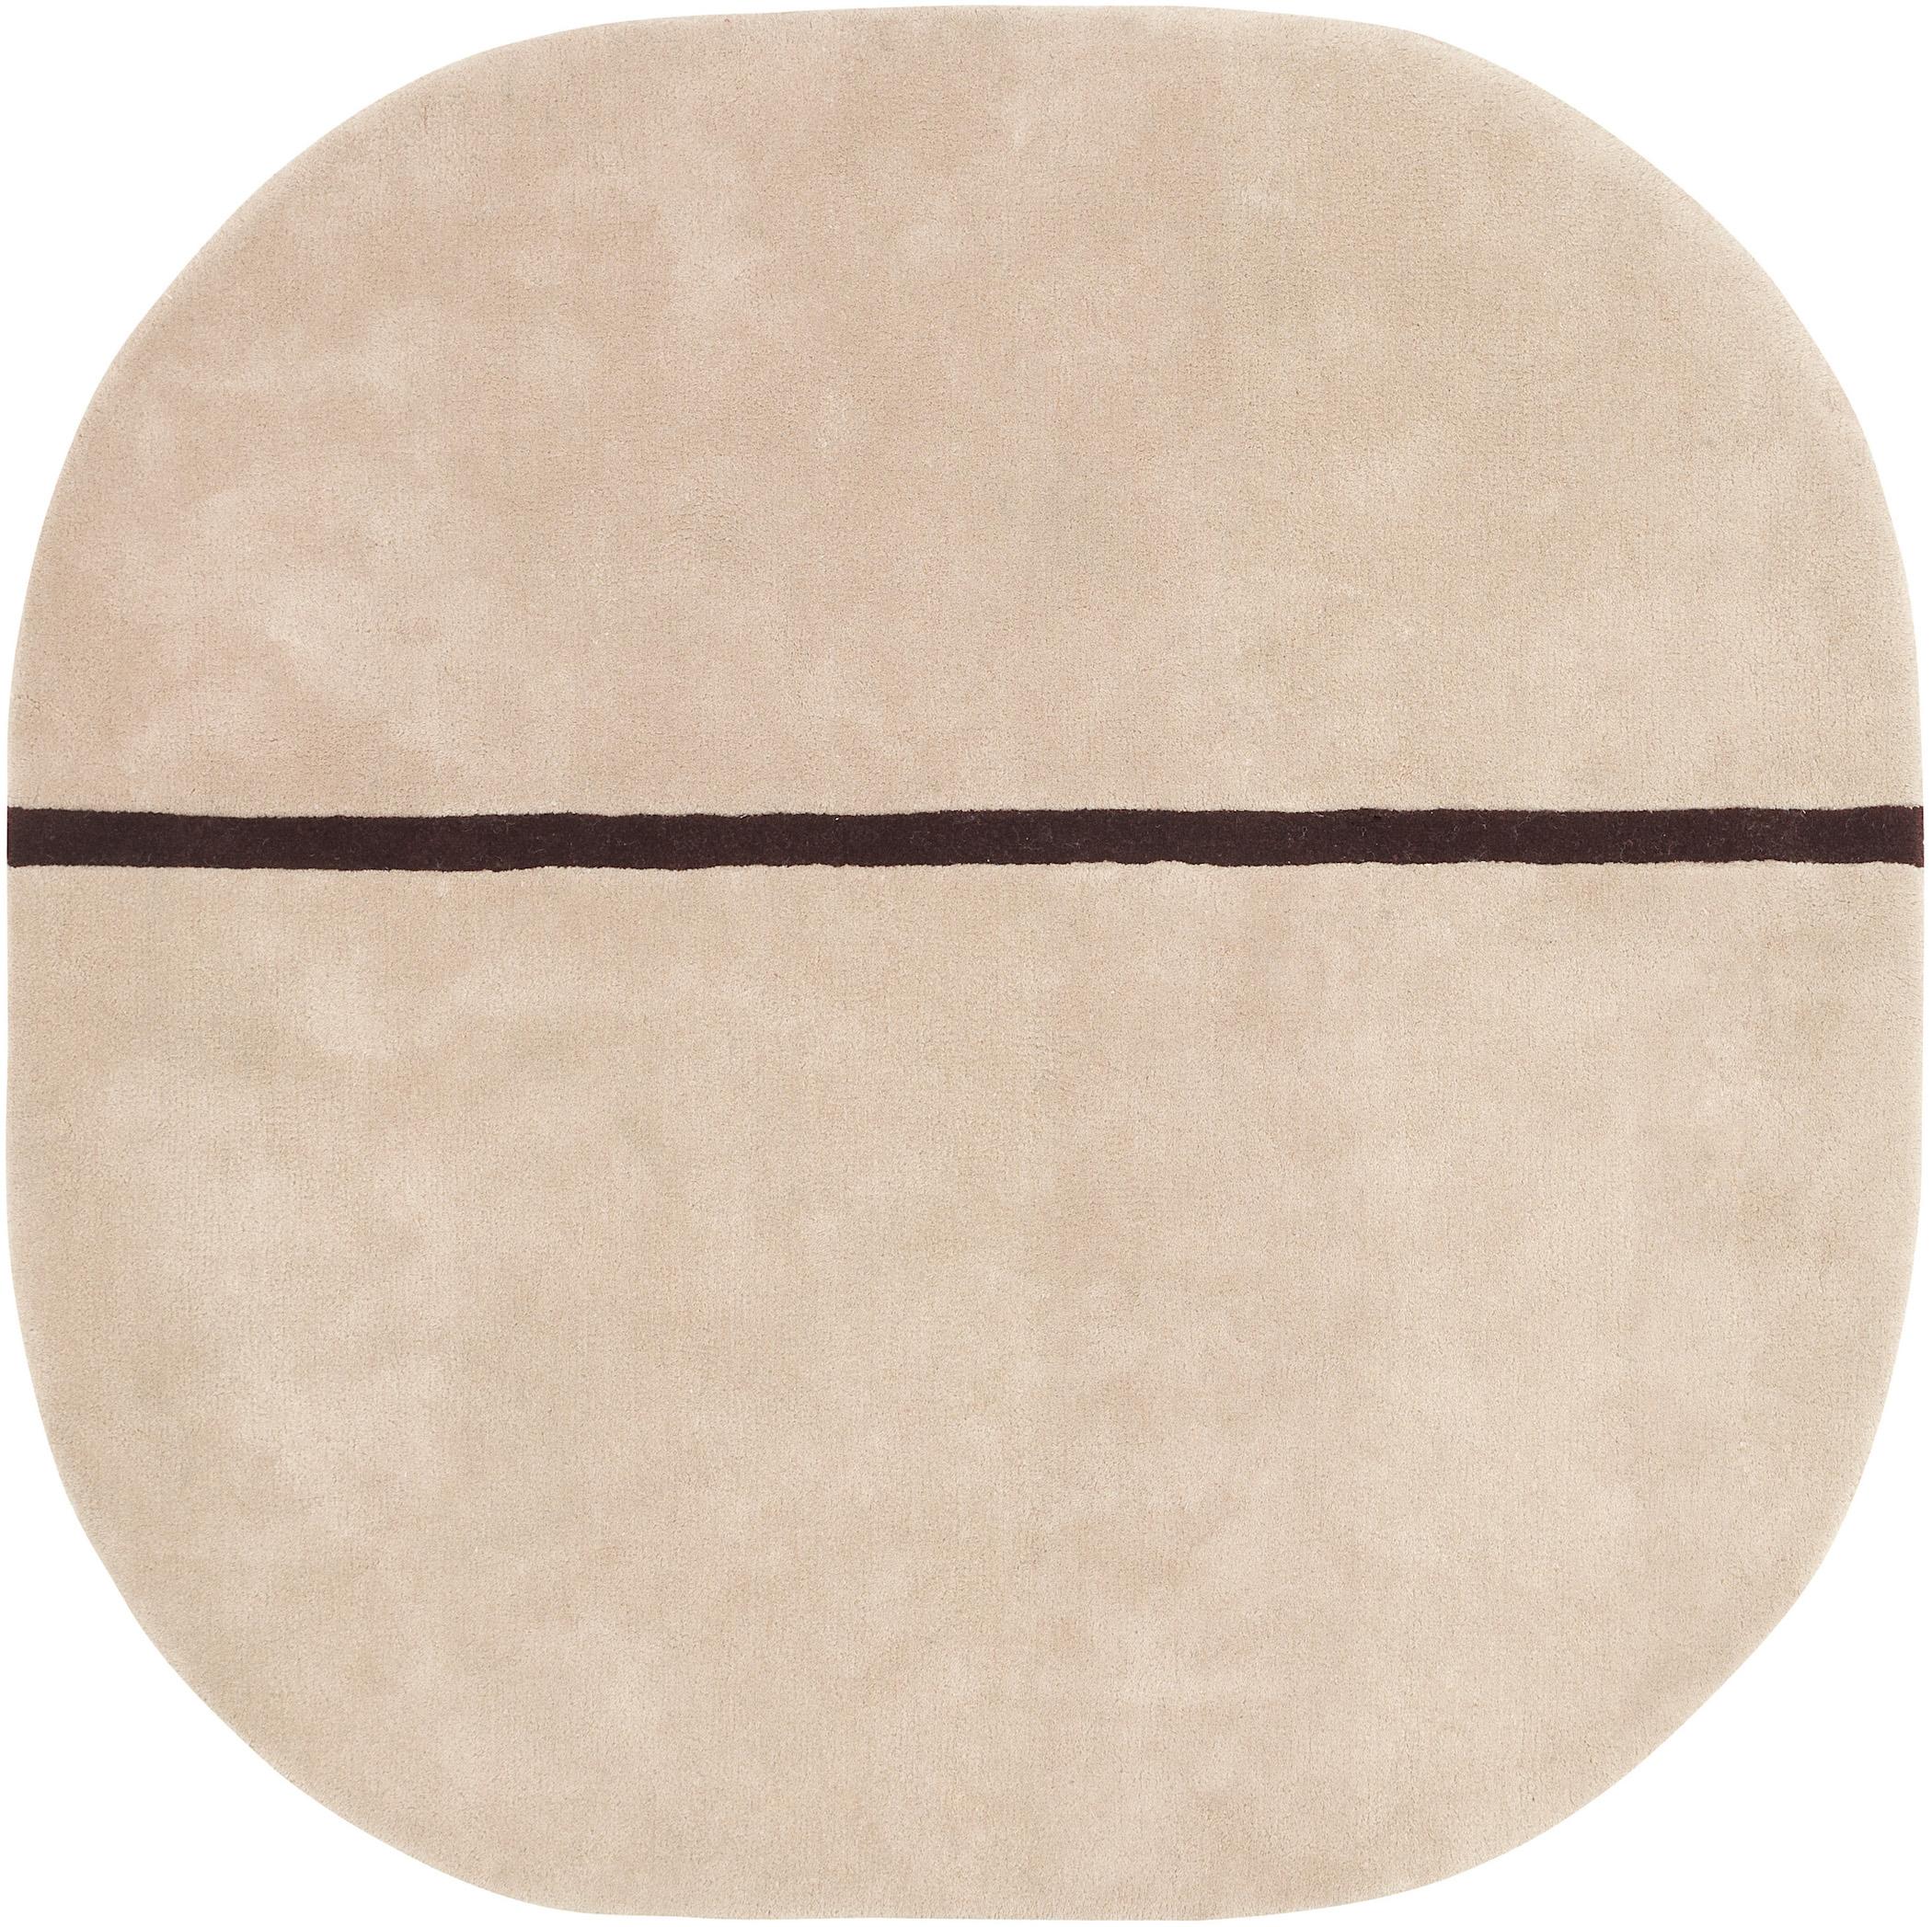 Normann Copenhagen Oona Carpets Design Simon Legald